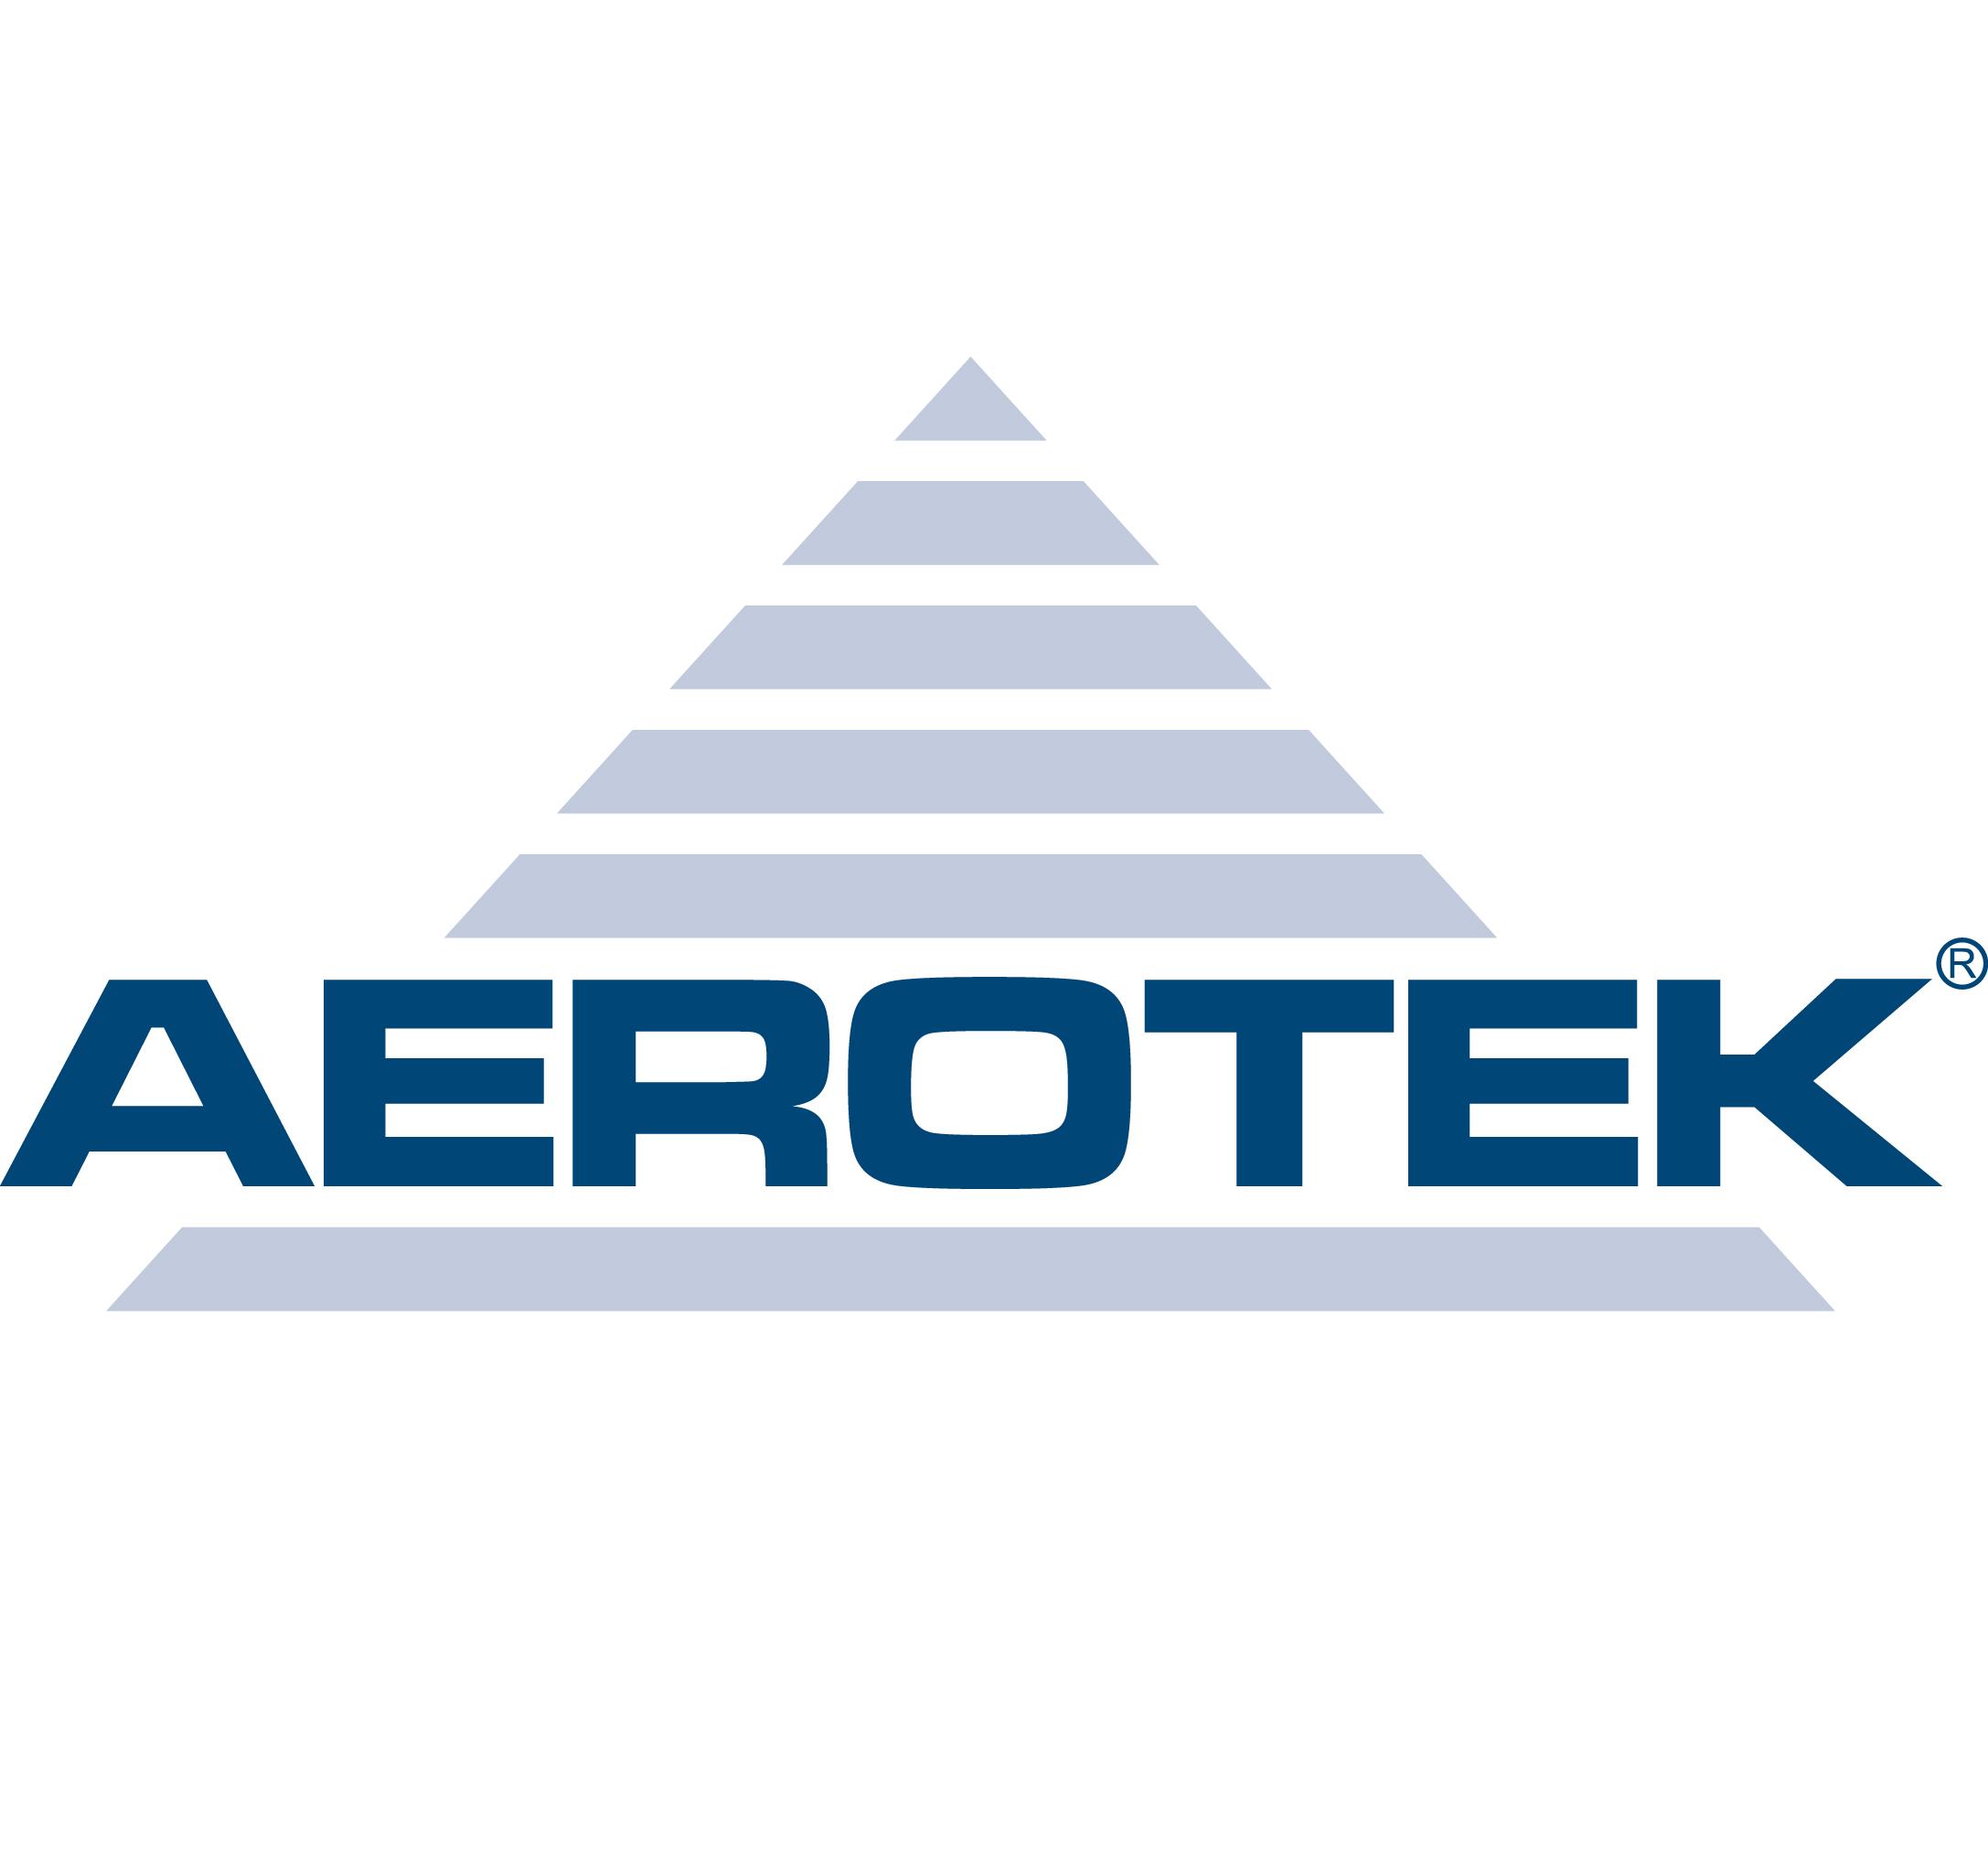 Aerotrek